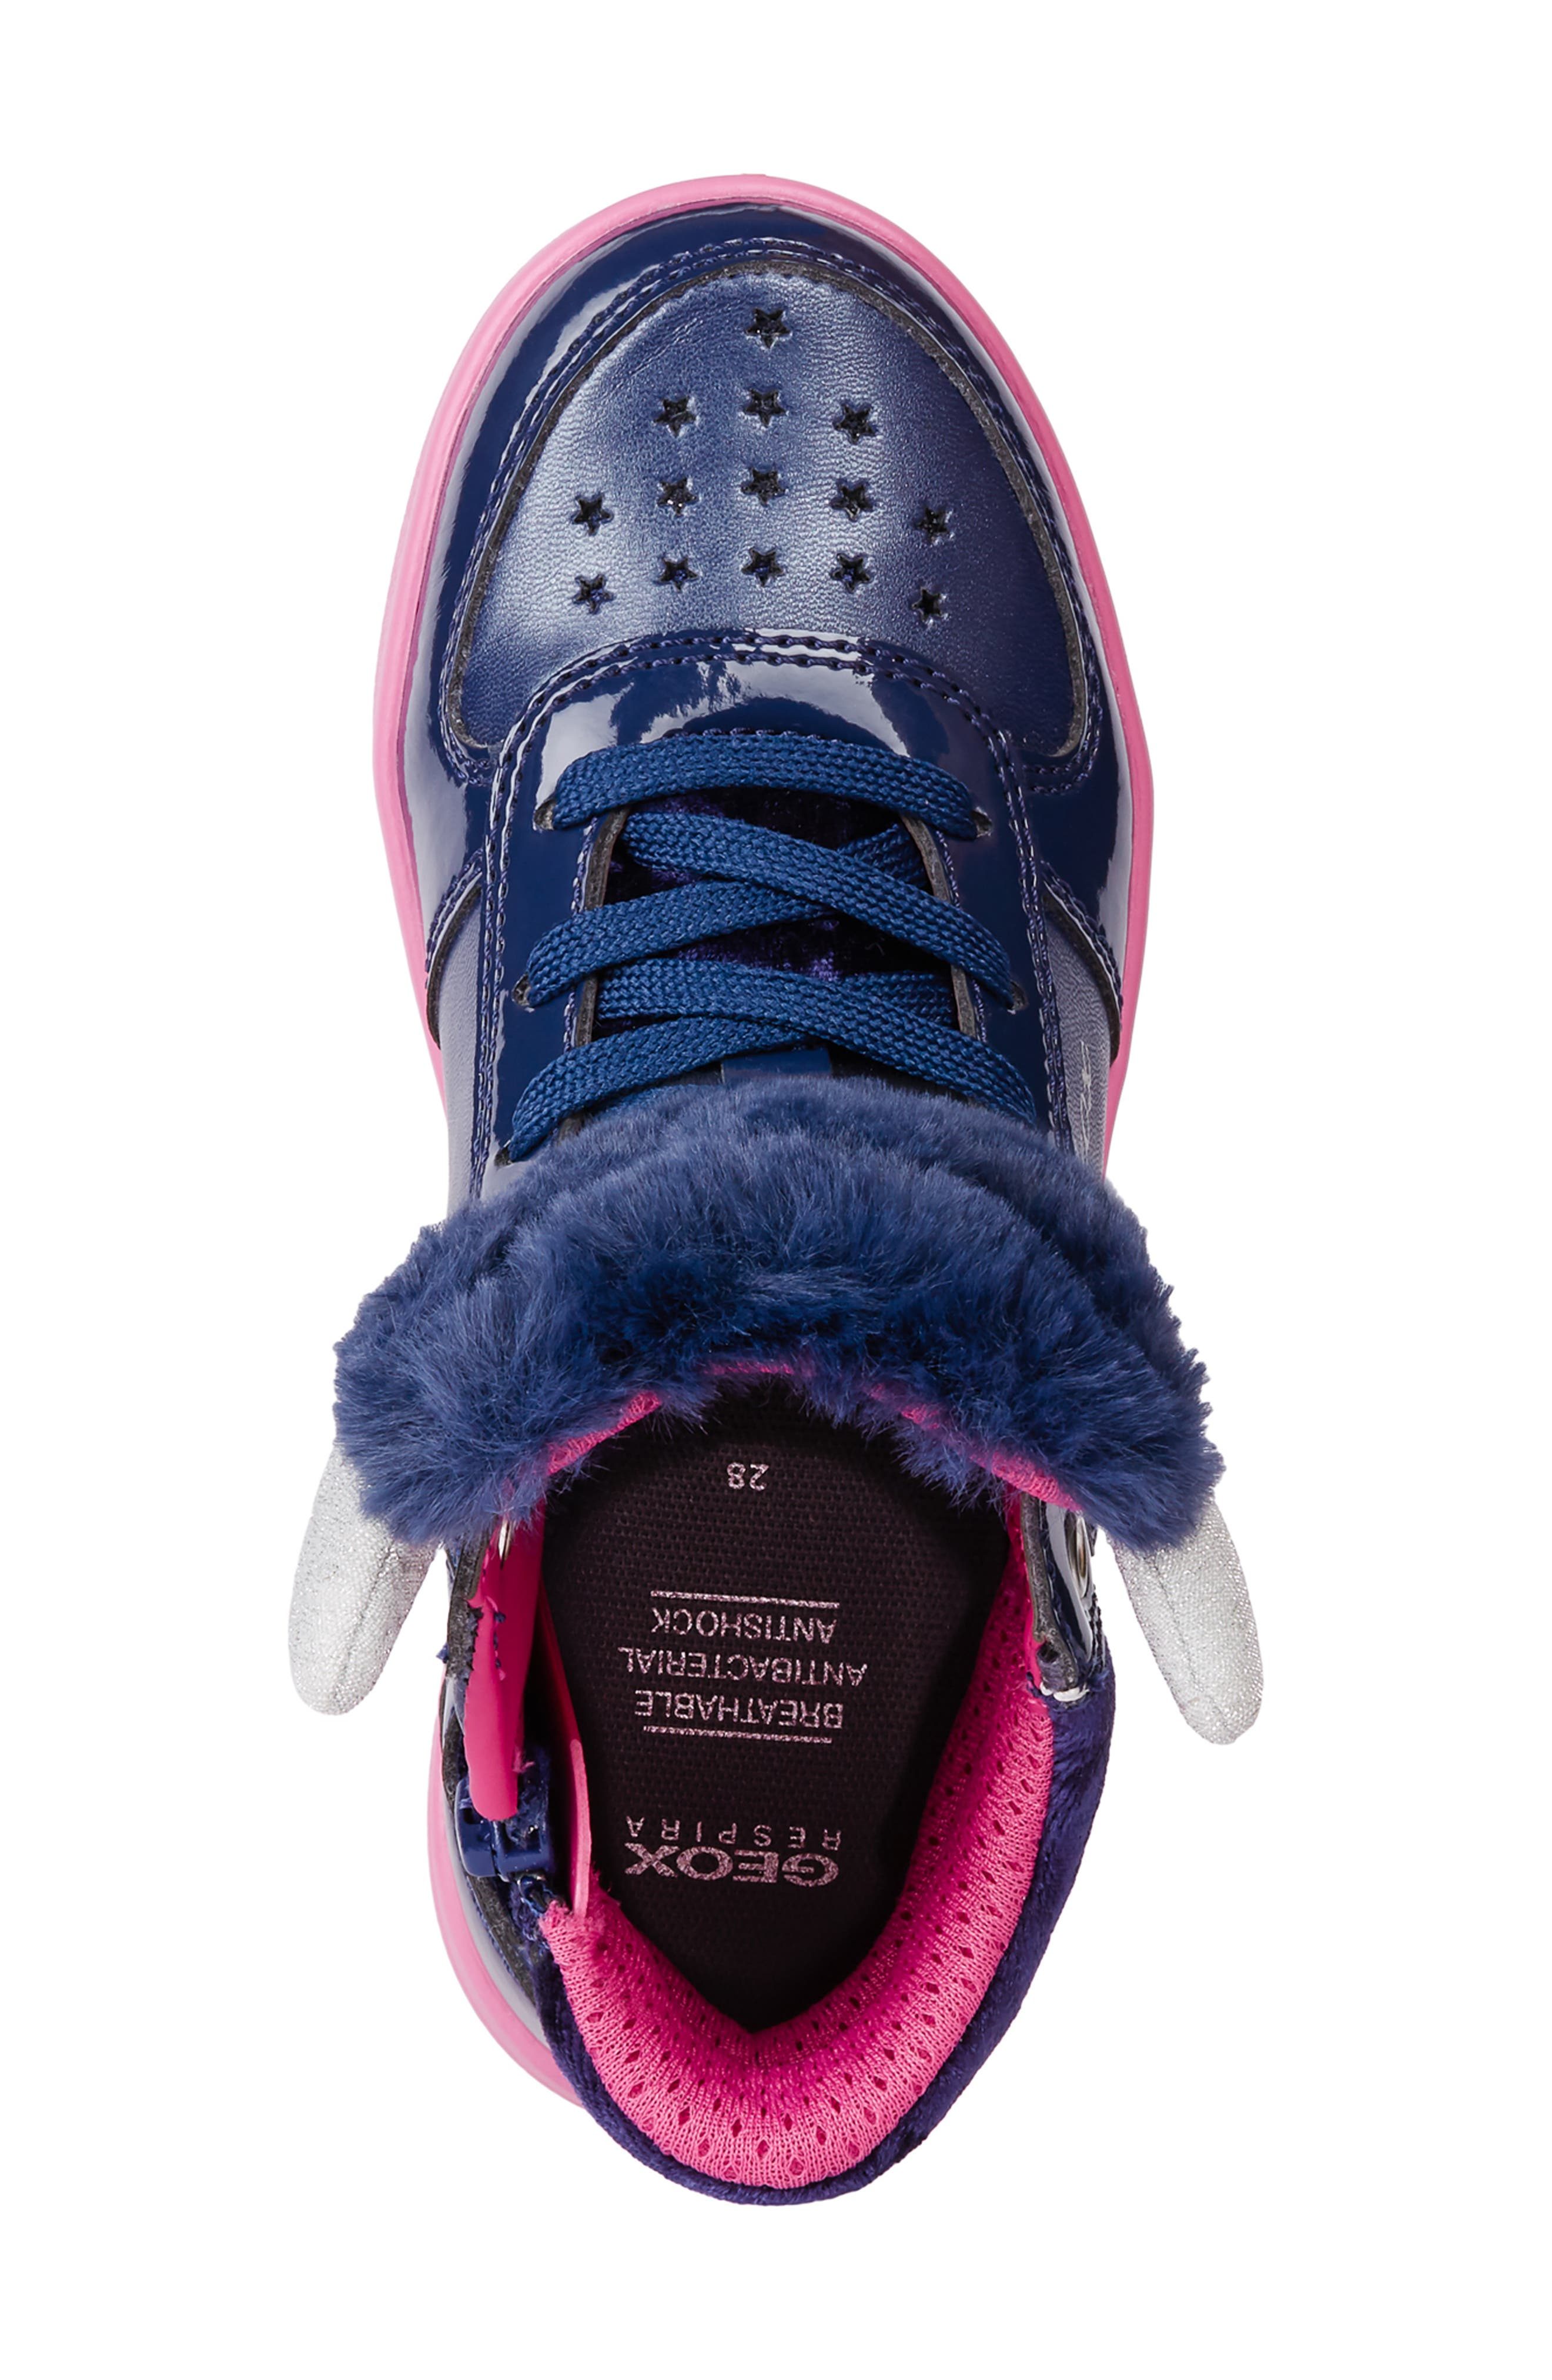 DJ Rock Fuzzy Friend Sneaker,                             Alternate thumbnail 5, color,                             NAVY/FUCHSIA